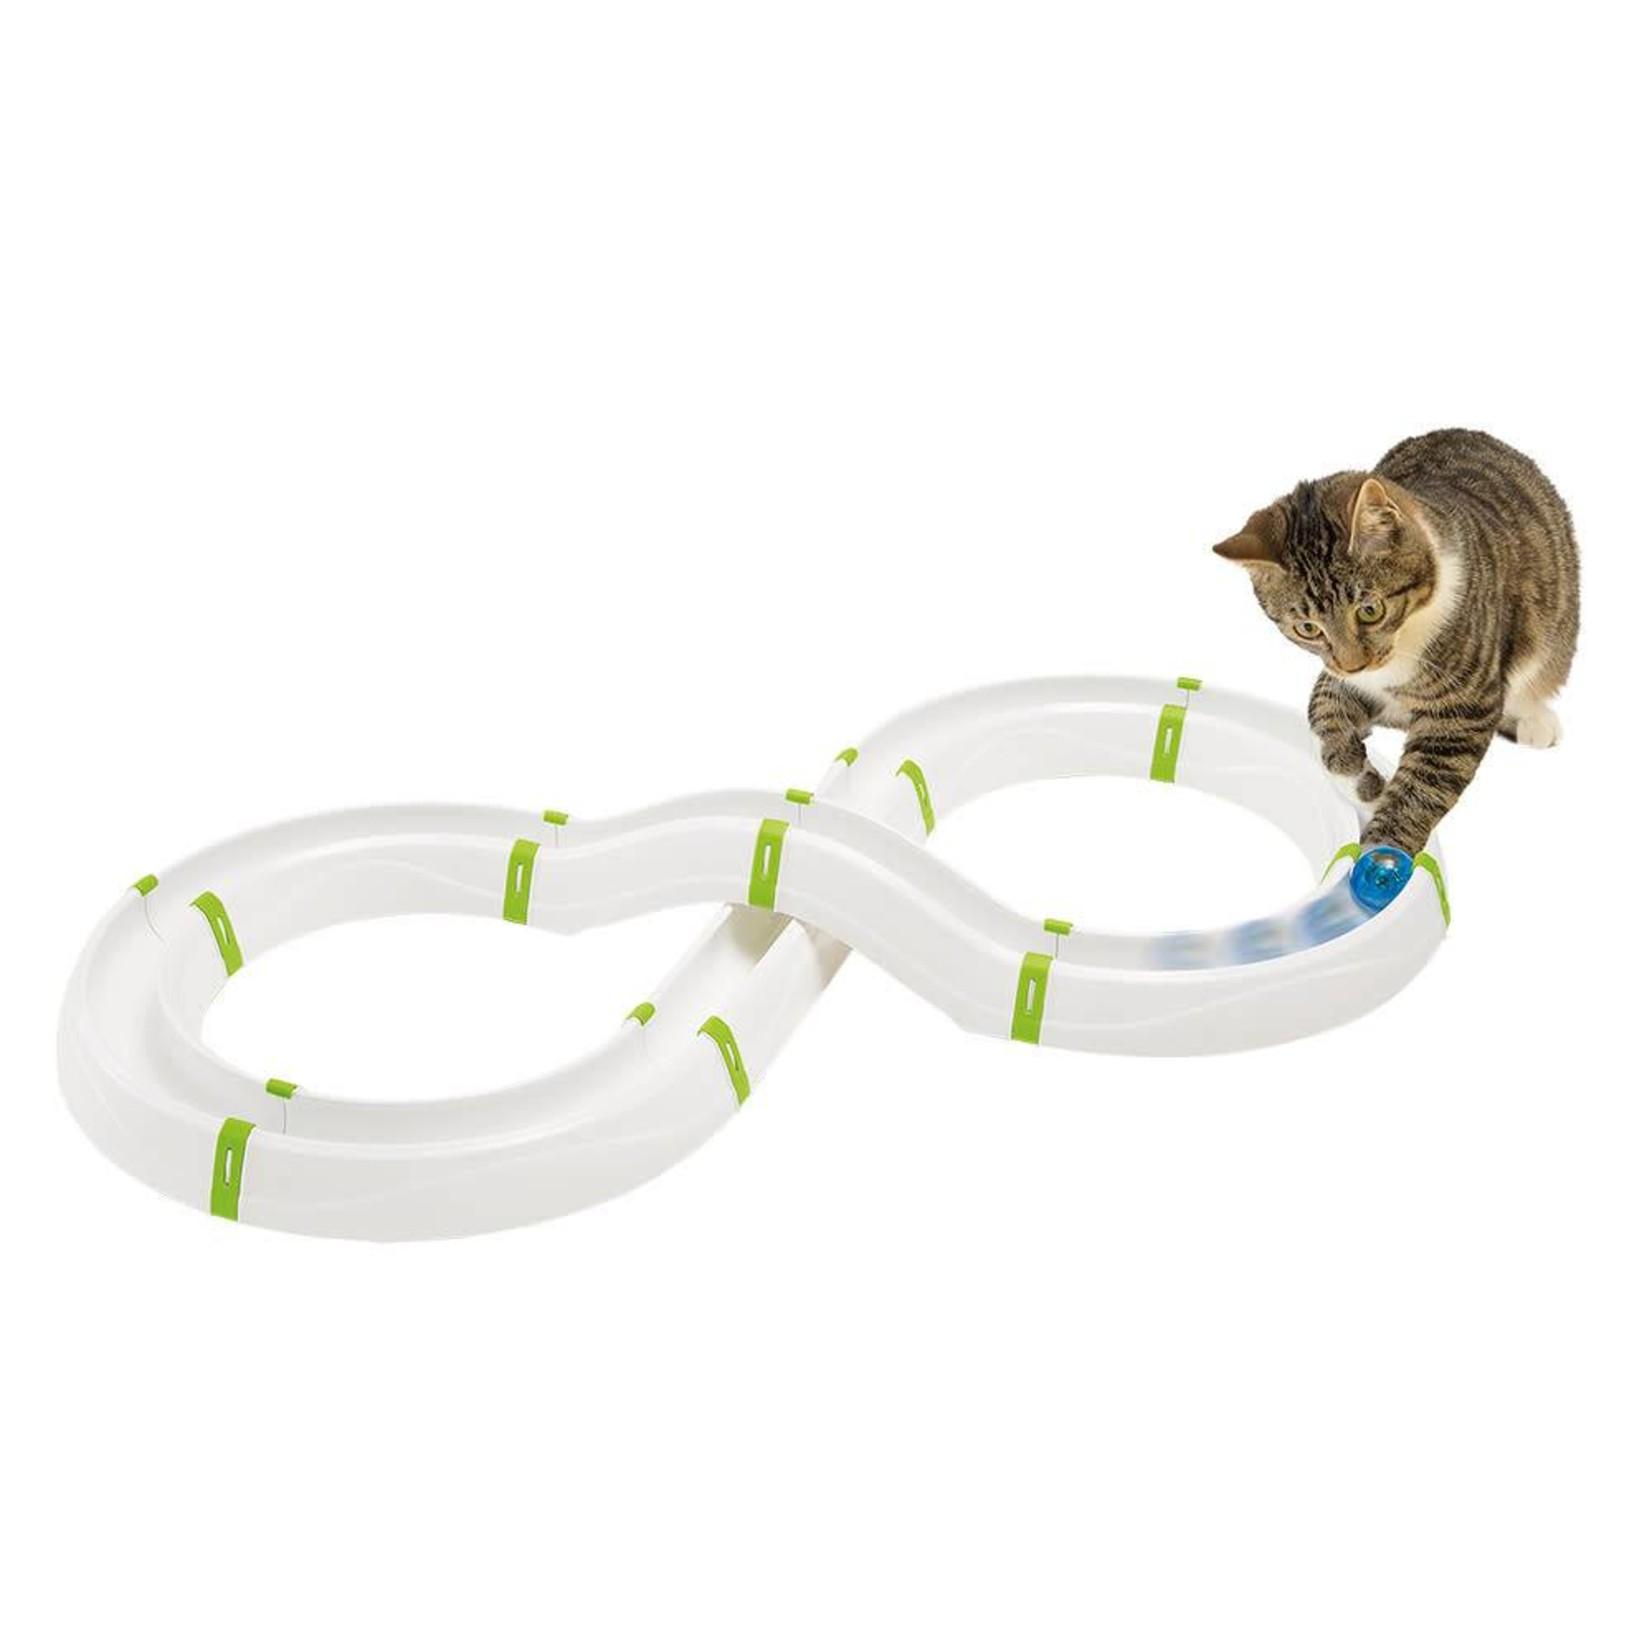 Ferplast Typhon Circuit Cat Toy